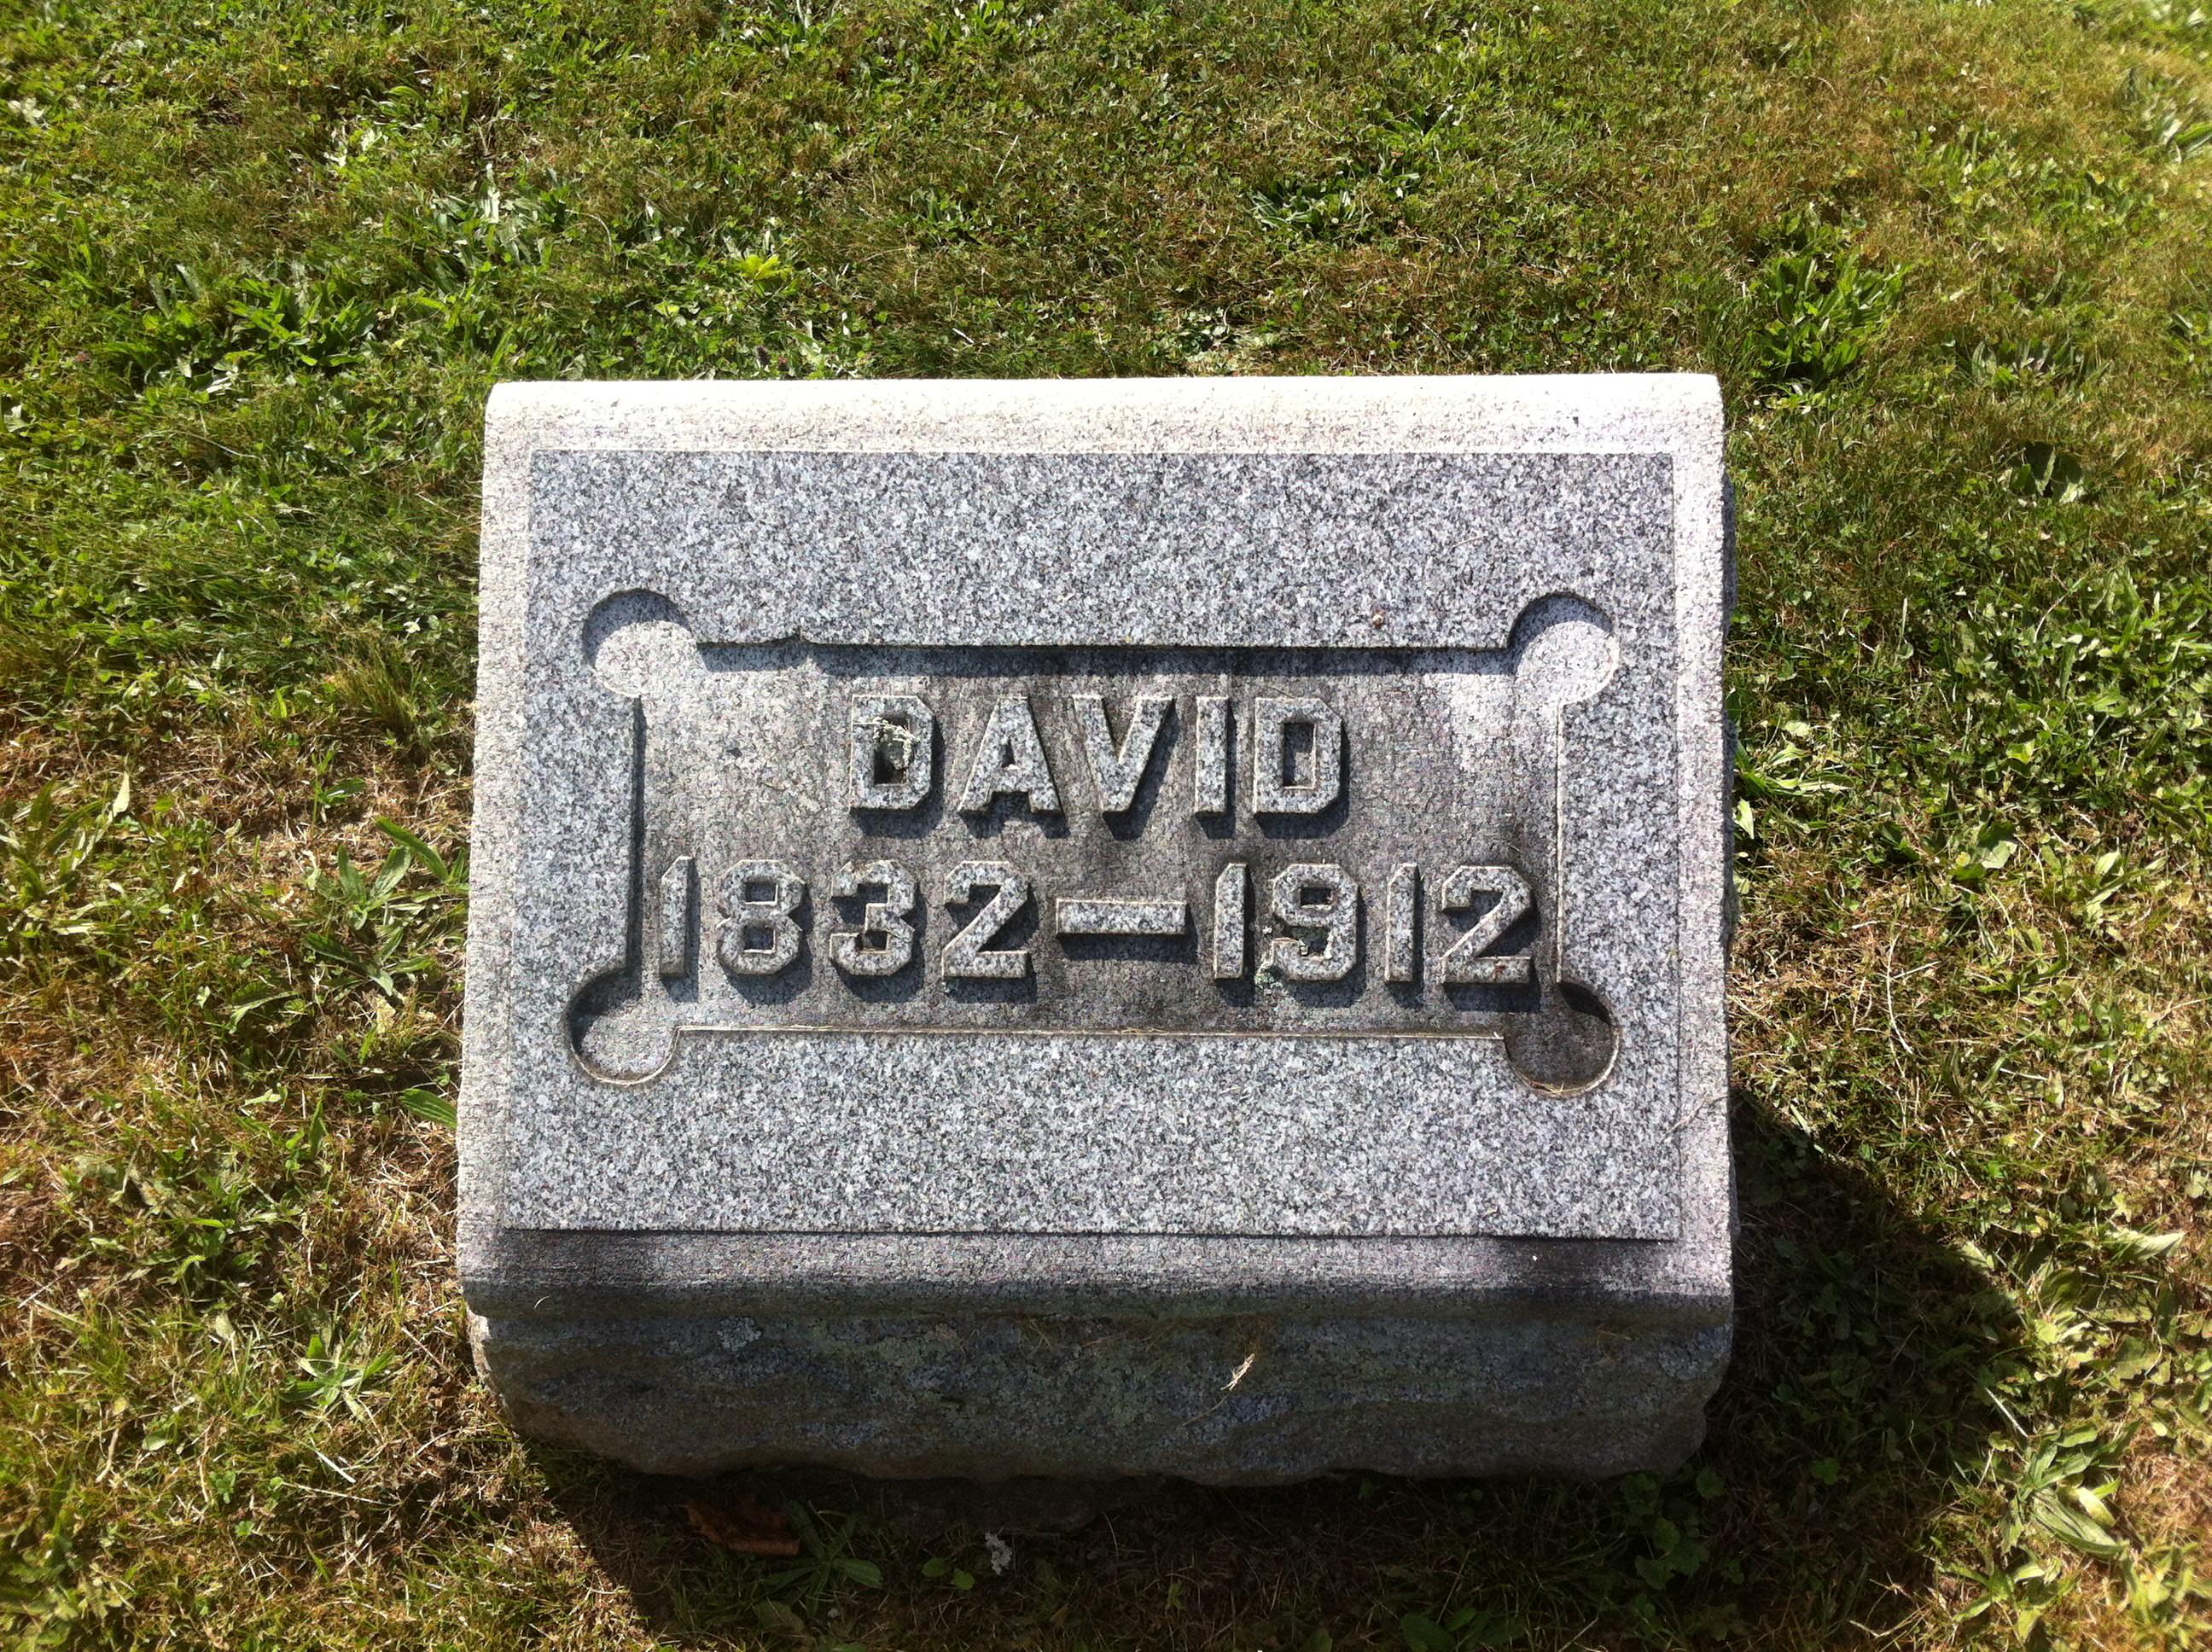 David Lichty